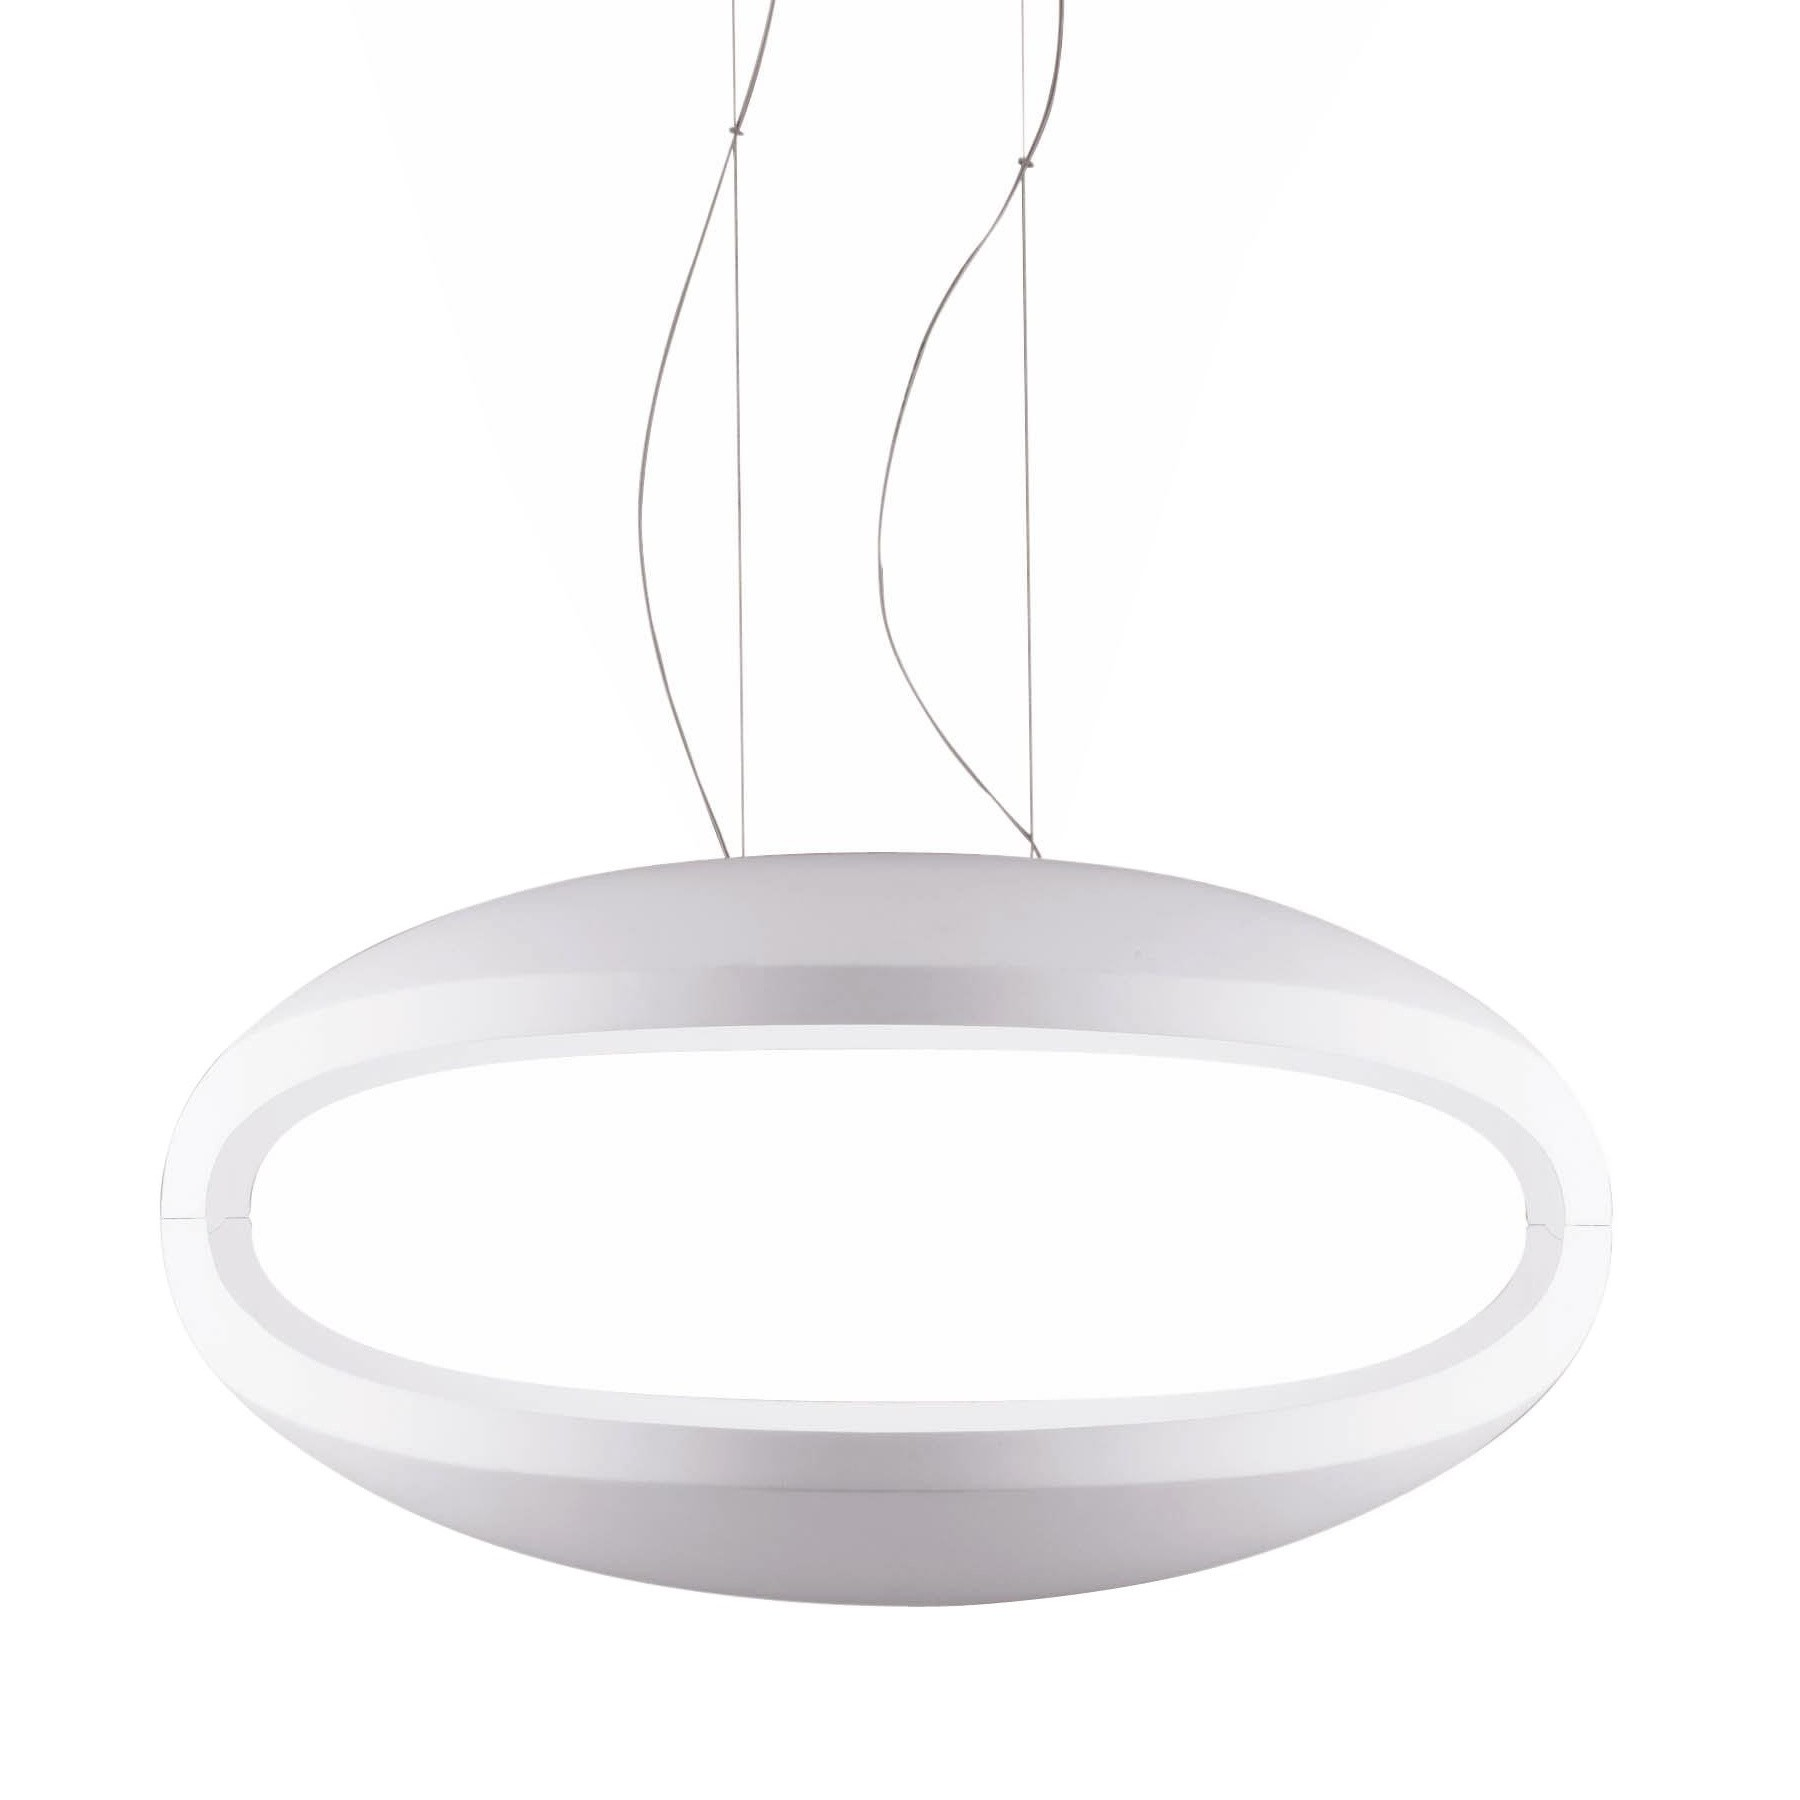 Lampe Caboche Patricia Urquiola o-space suspension lamp